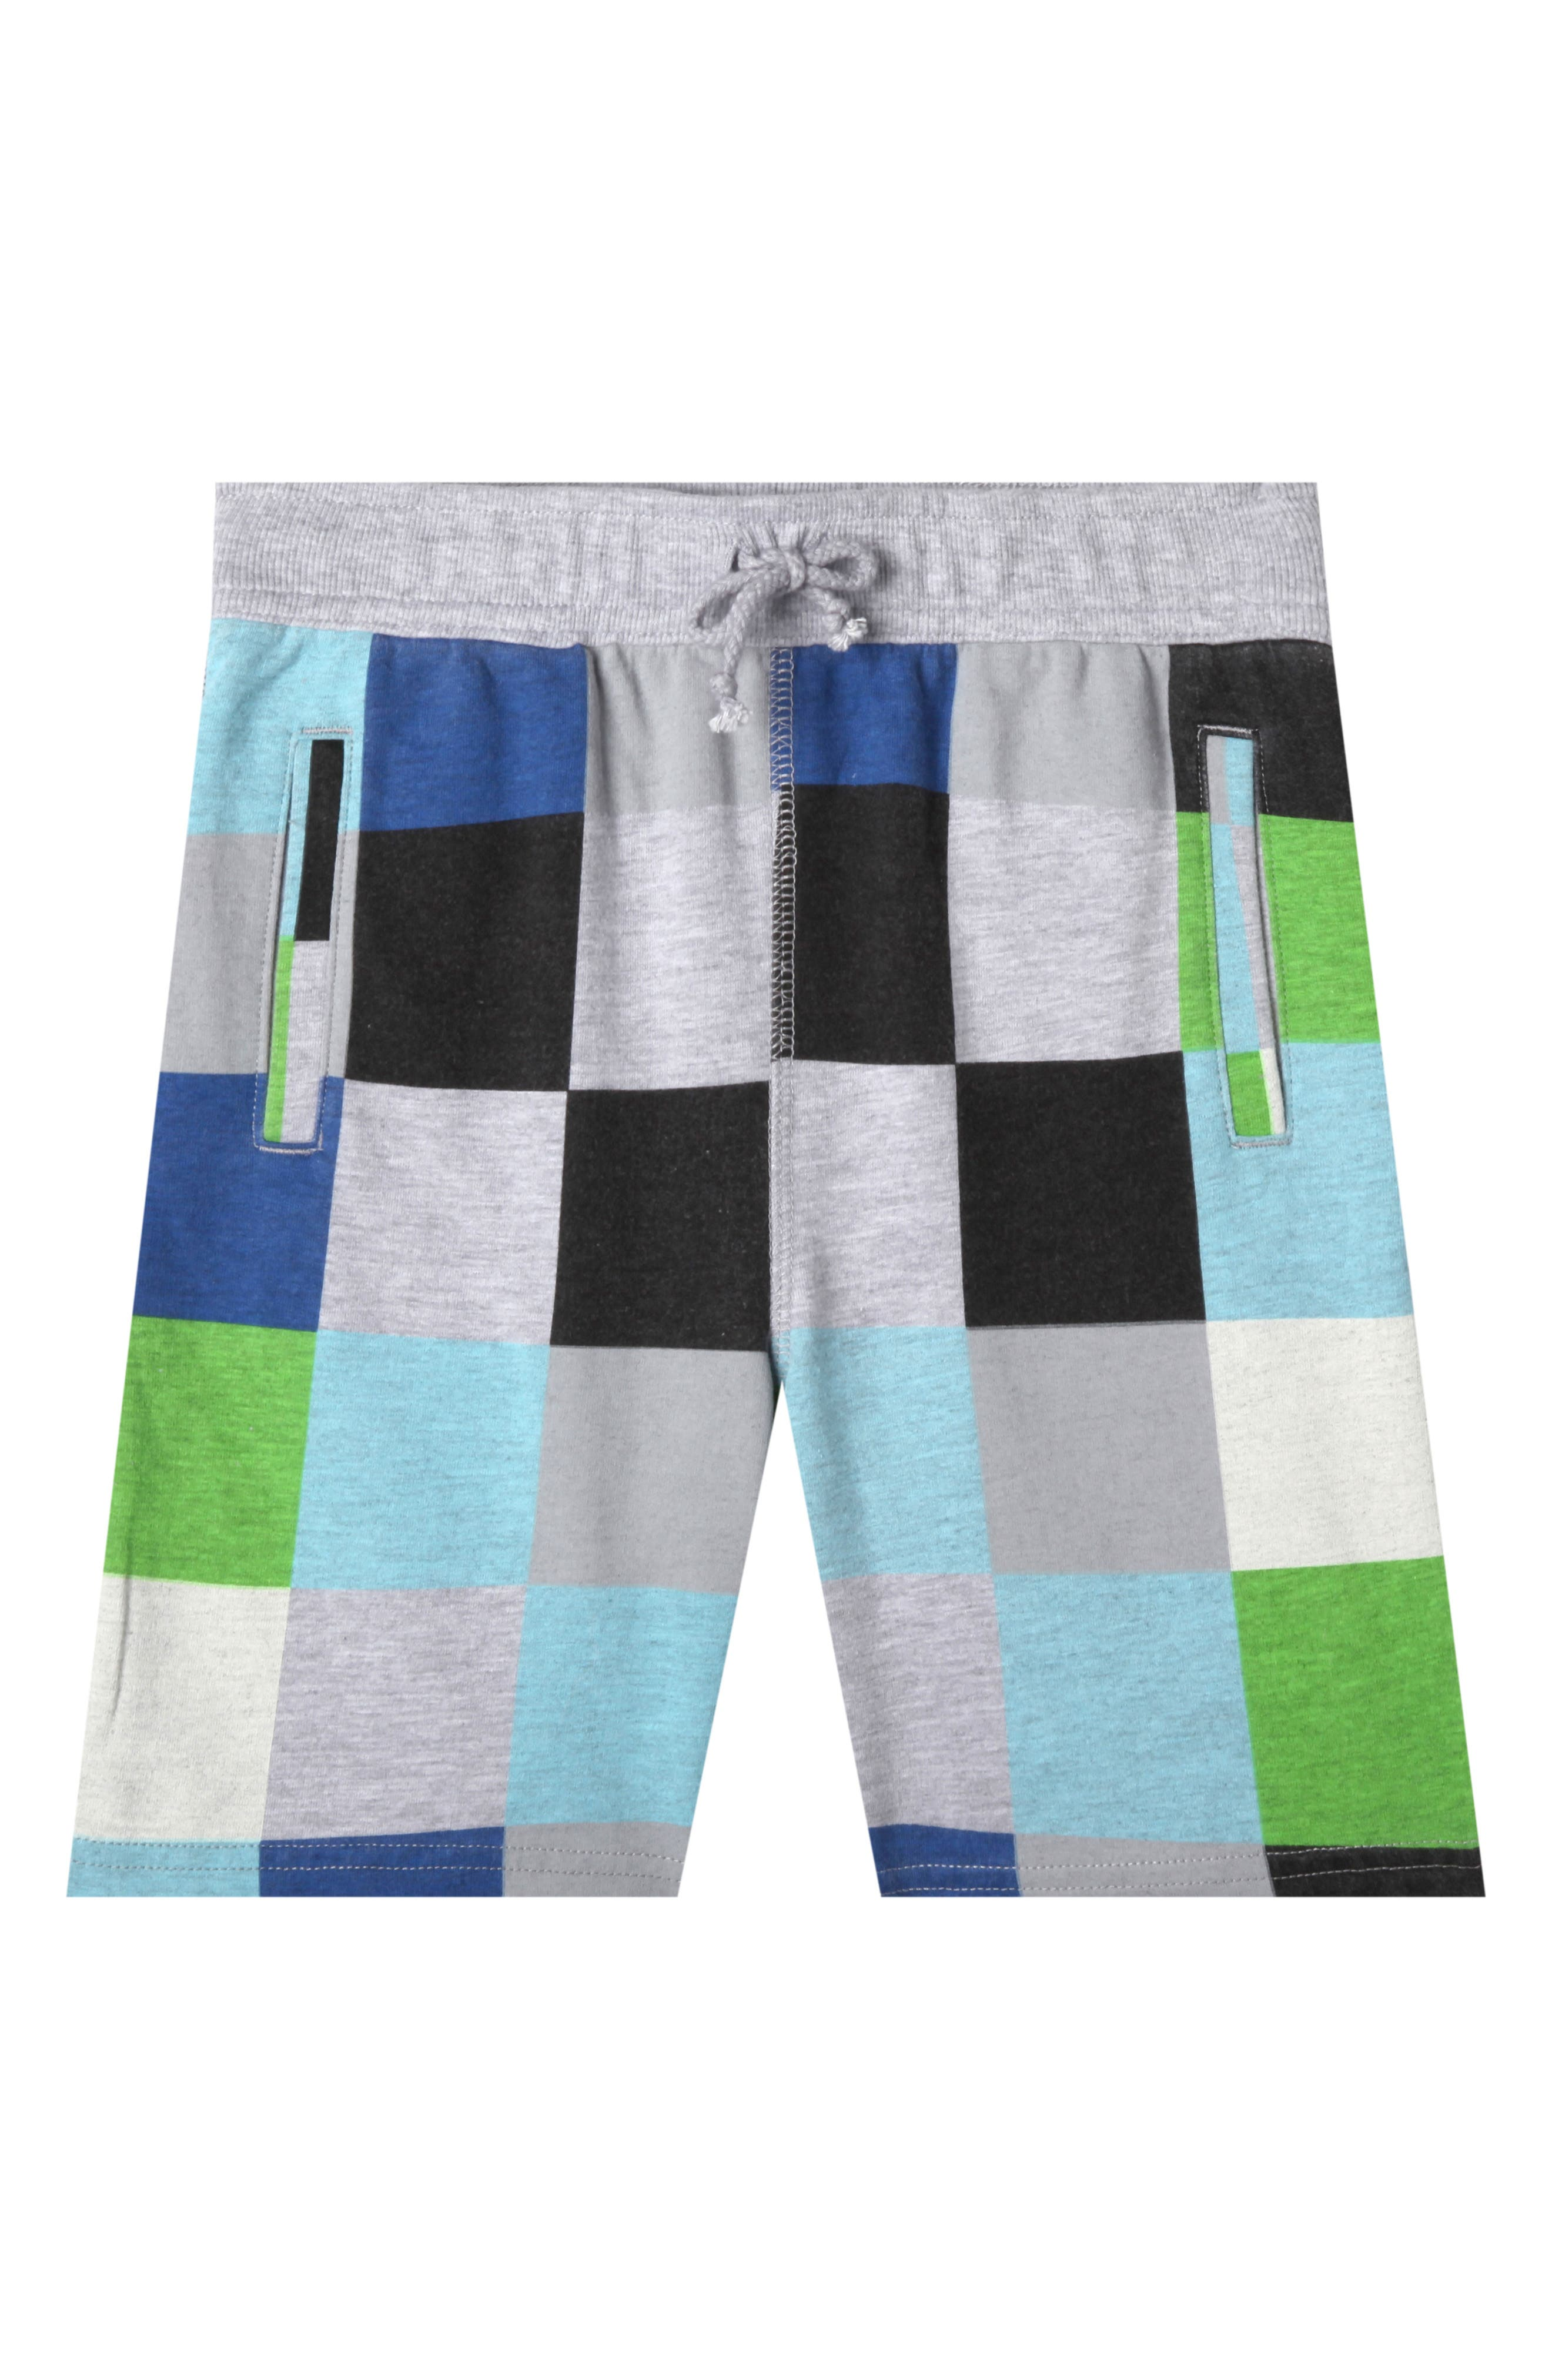 Main Image - Art & Eden Lucas Print Knit Shorts (Toddler Boys, Little Boys & Big Boys)